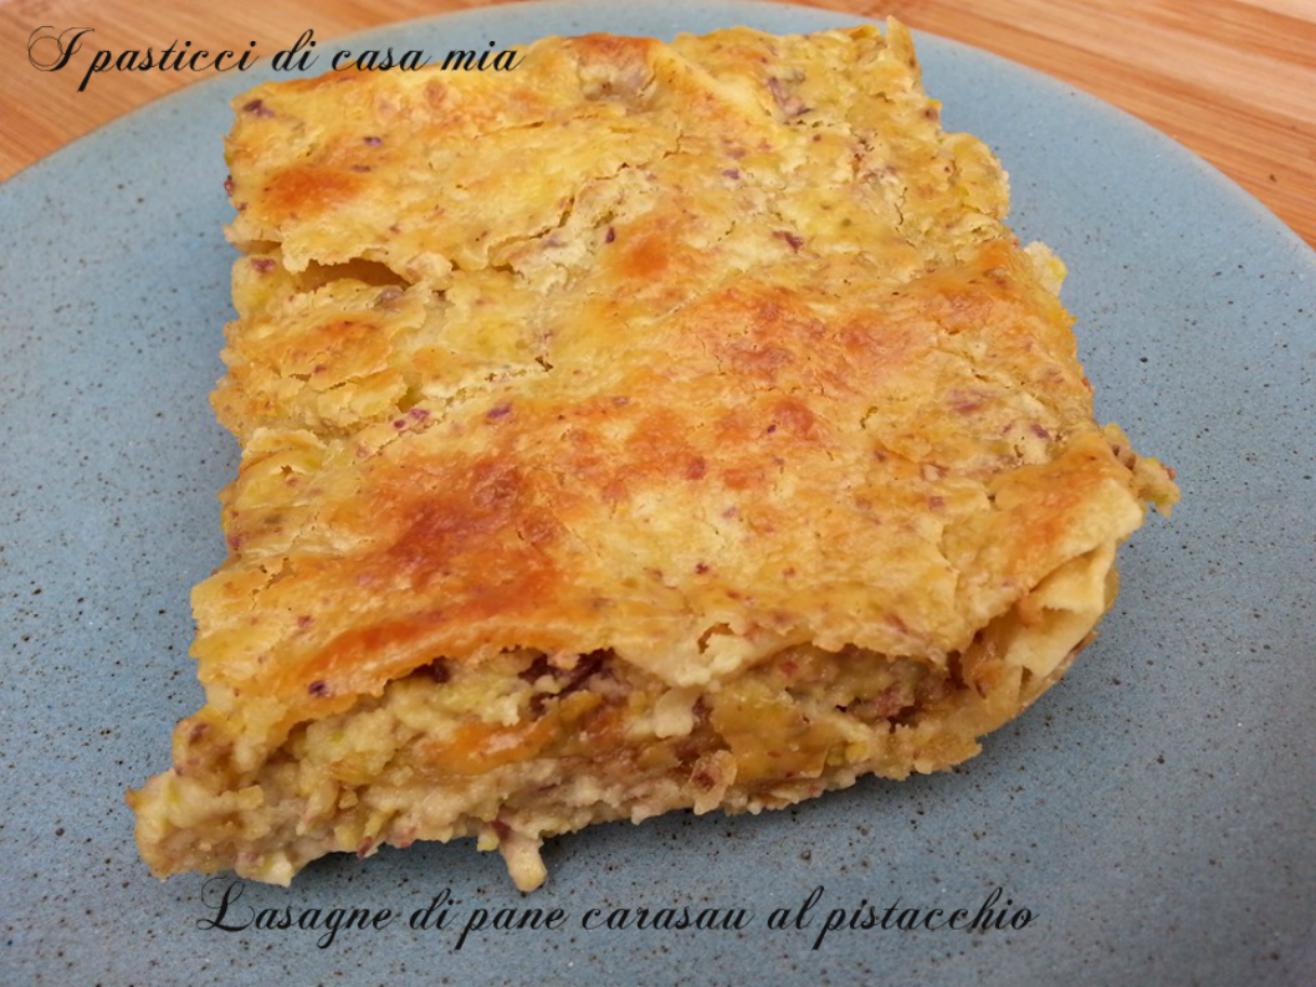 Lasagne di pane carasau al pistacchio